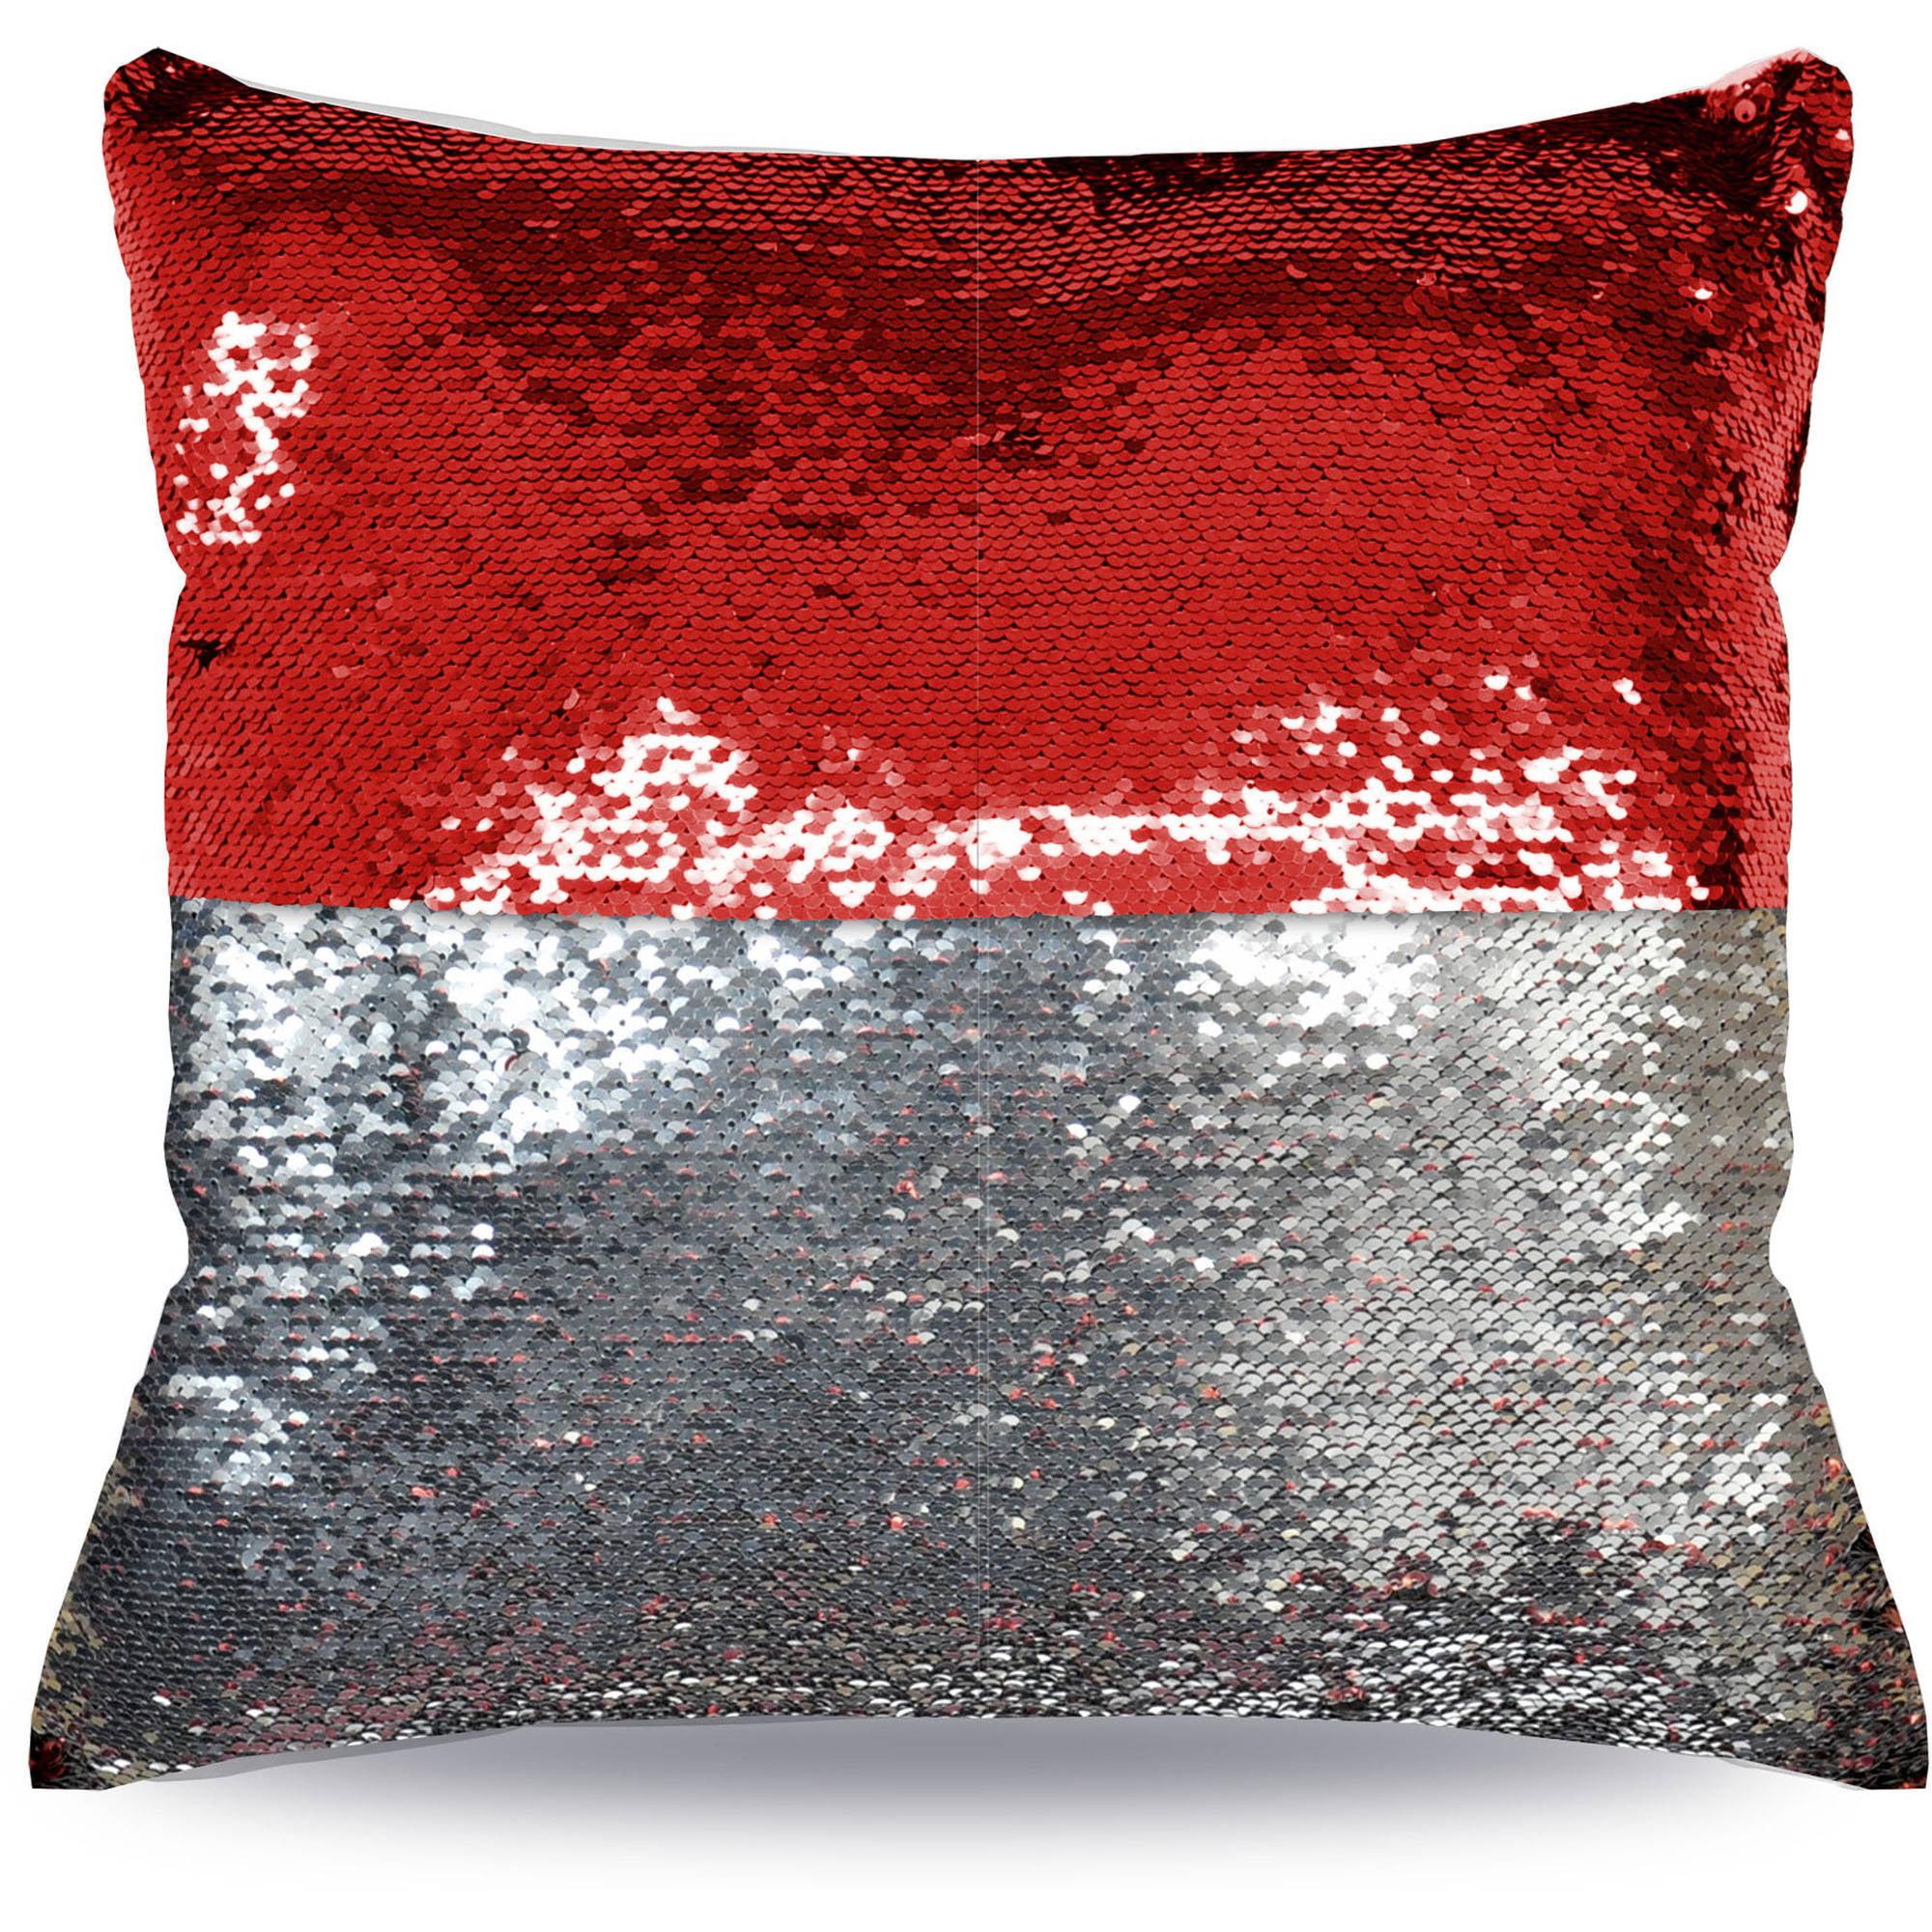 Best Decorative Pillow Websites : Mainstays 17